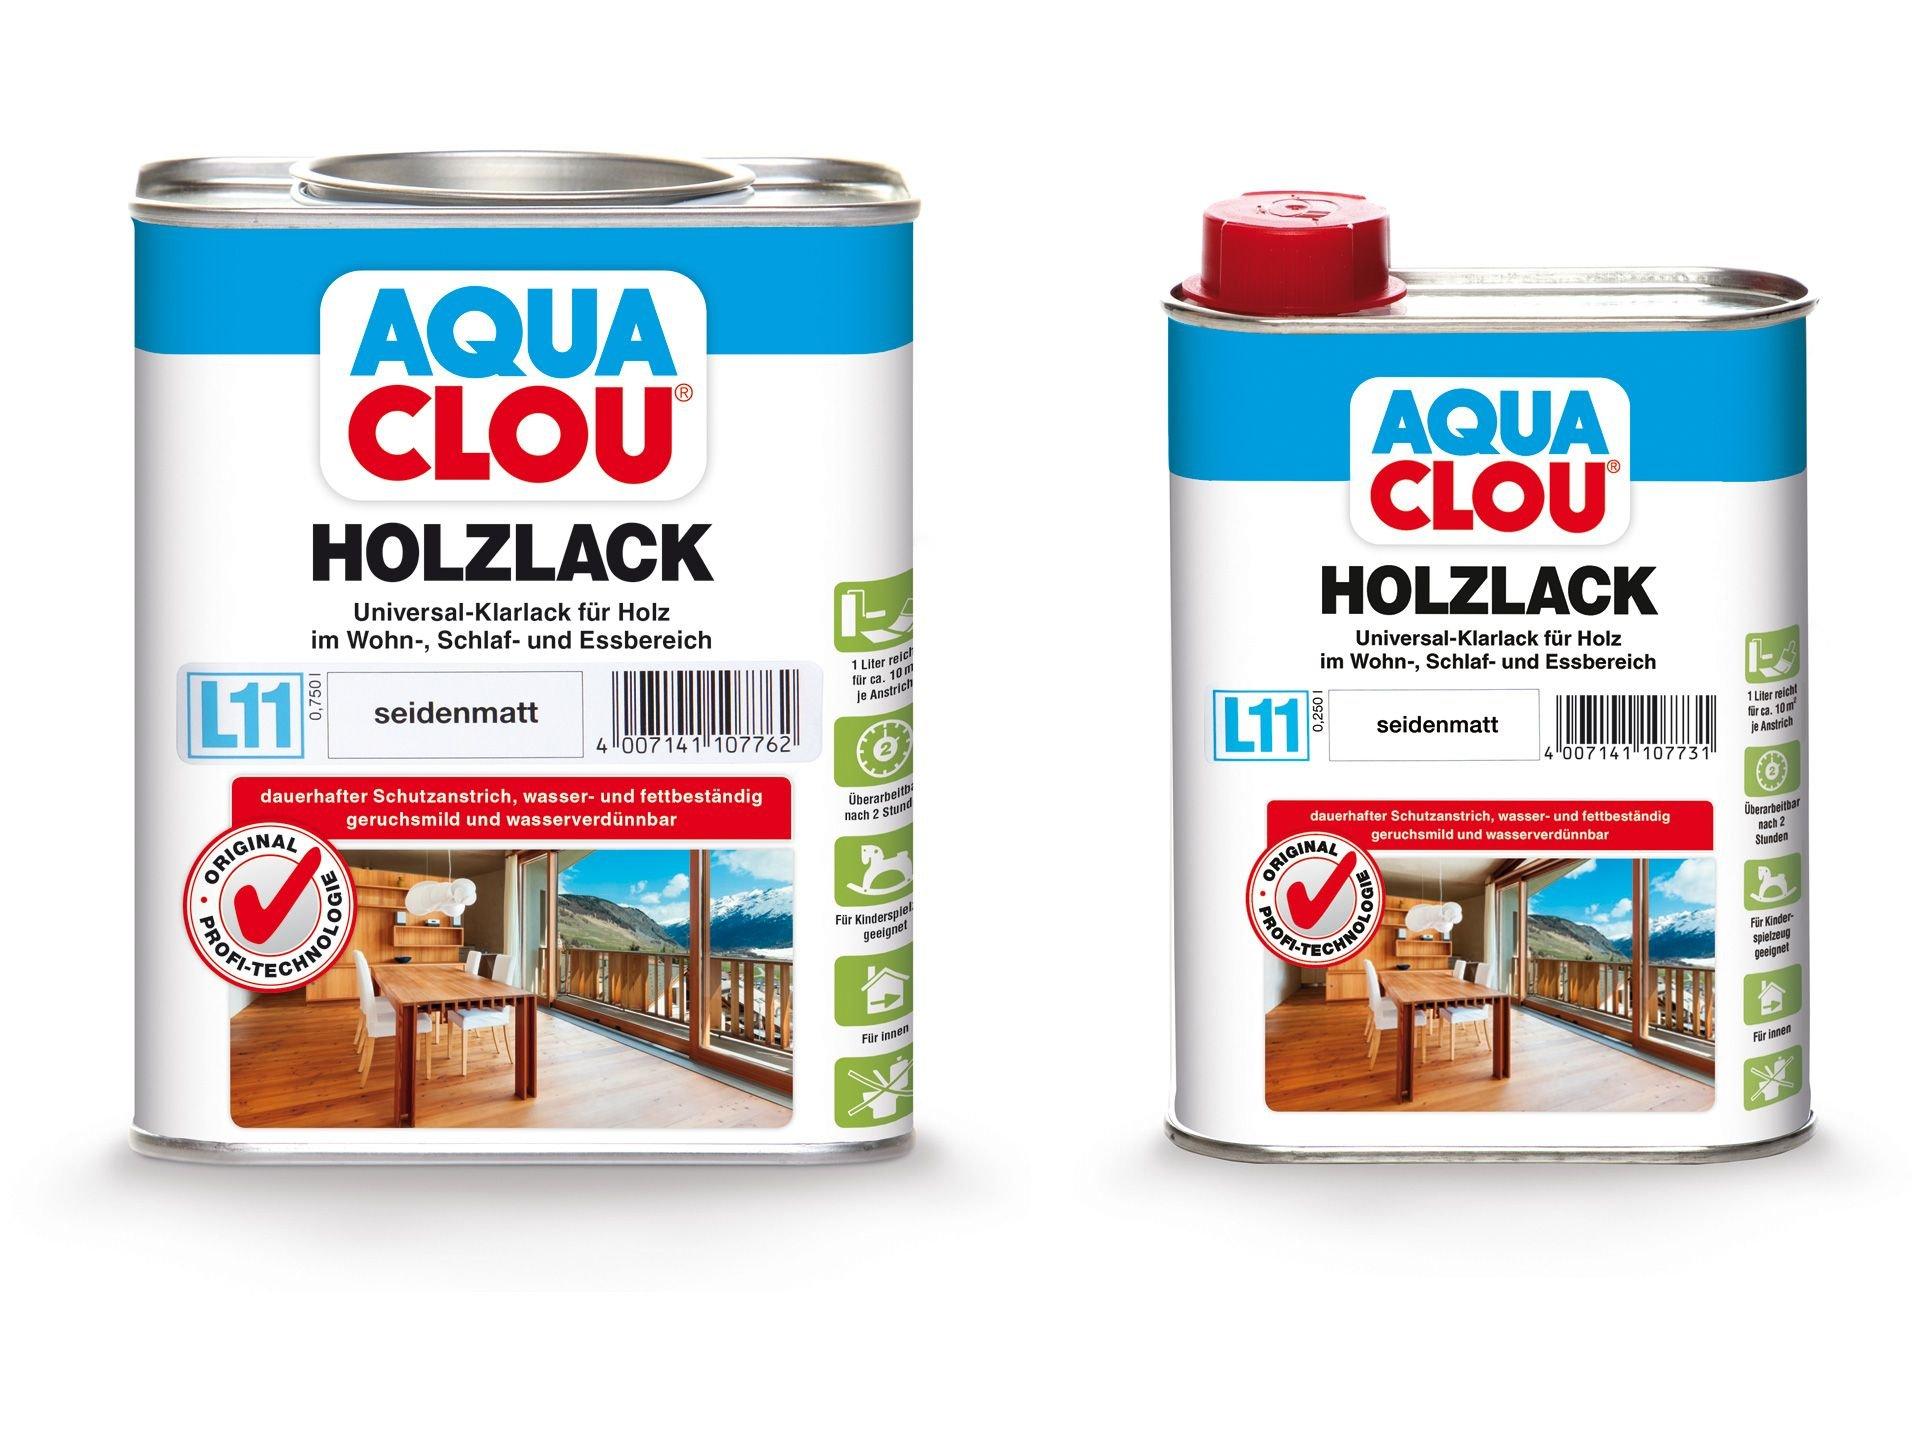 clou aqua holzlack protect l11 online kaufen modulor. Black Bedroom Furniture Sets. Home Design Ideas